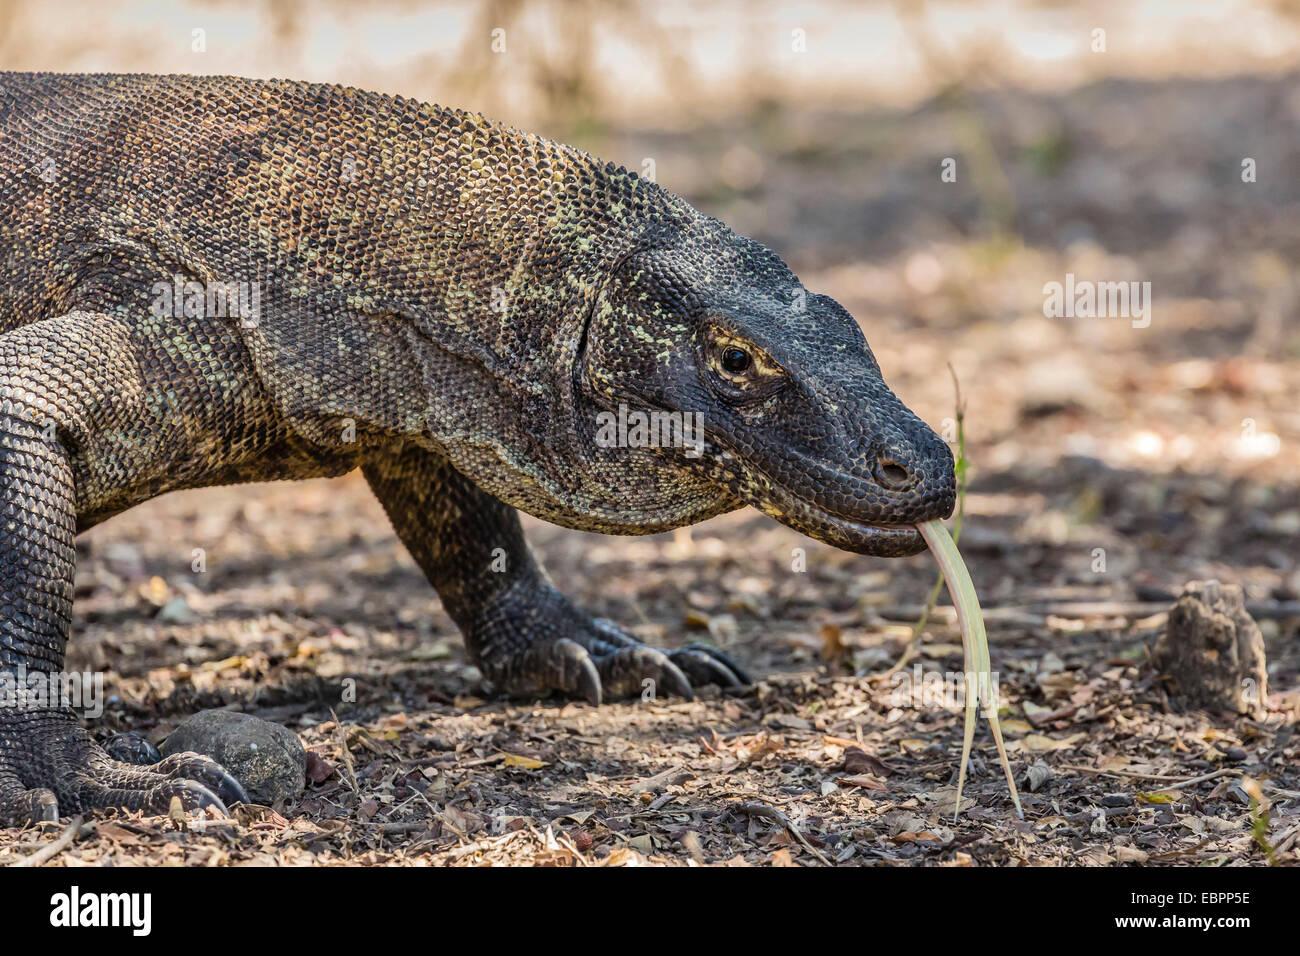 Des profils dragon de Komodo (Varanus komodoensis), dans le Parc National de Komodo, l'île de Komodo, en Photo Stock